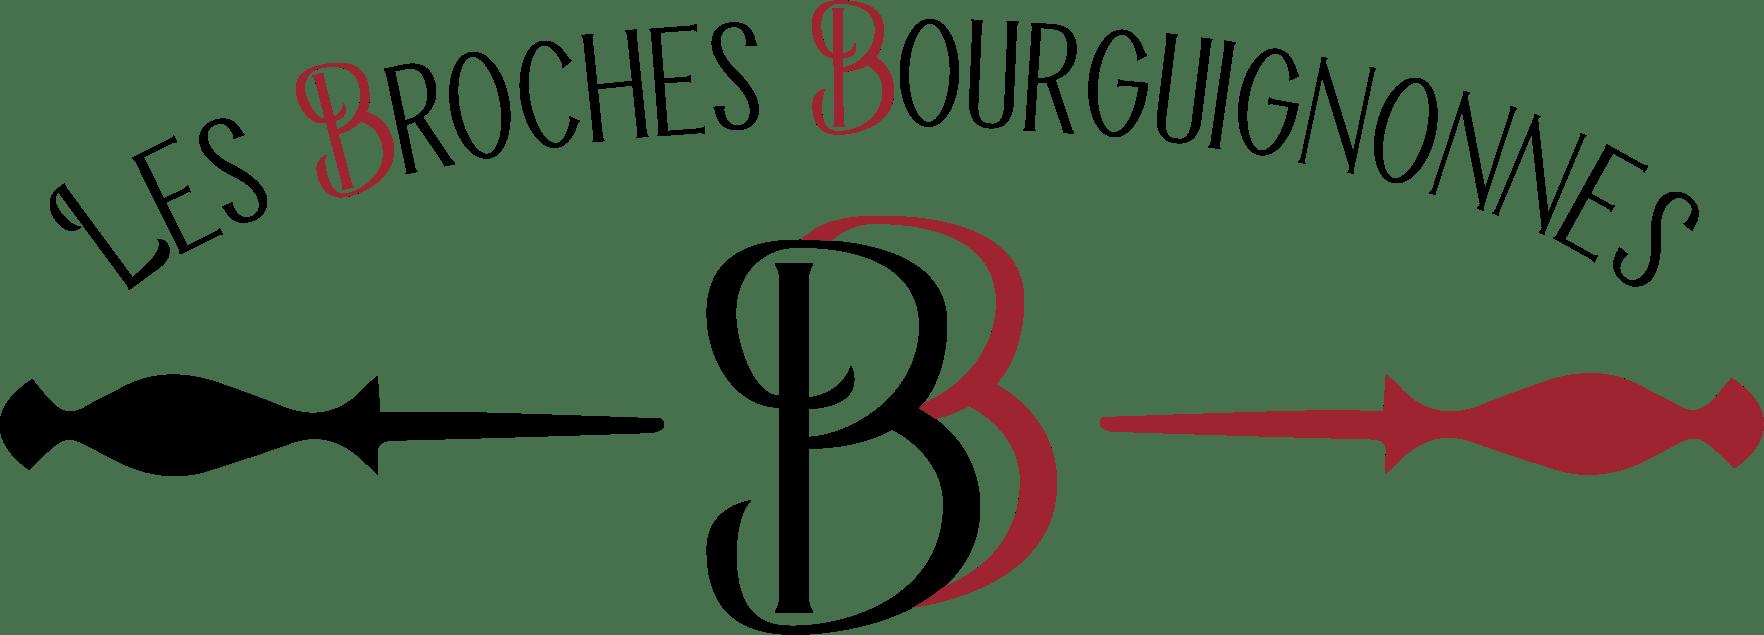 Logo Les Broches Bourguignonnes